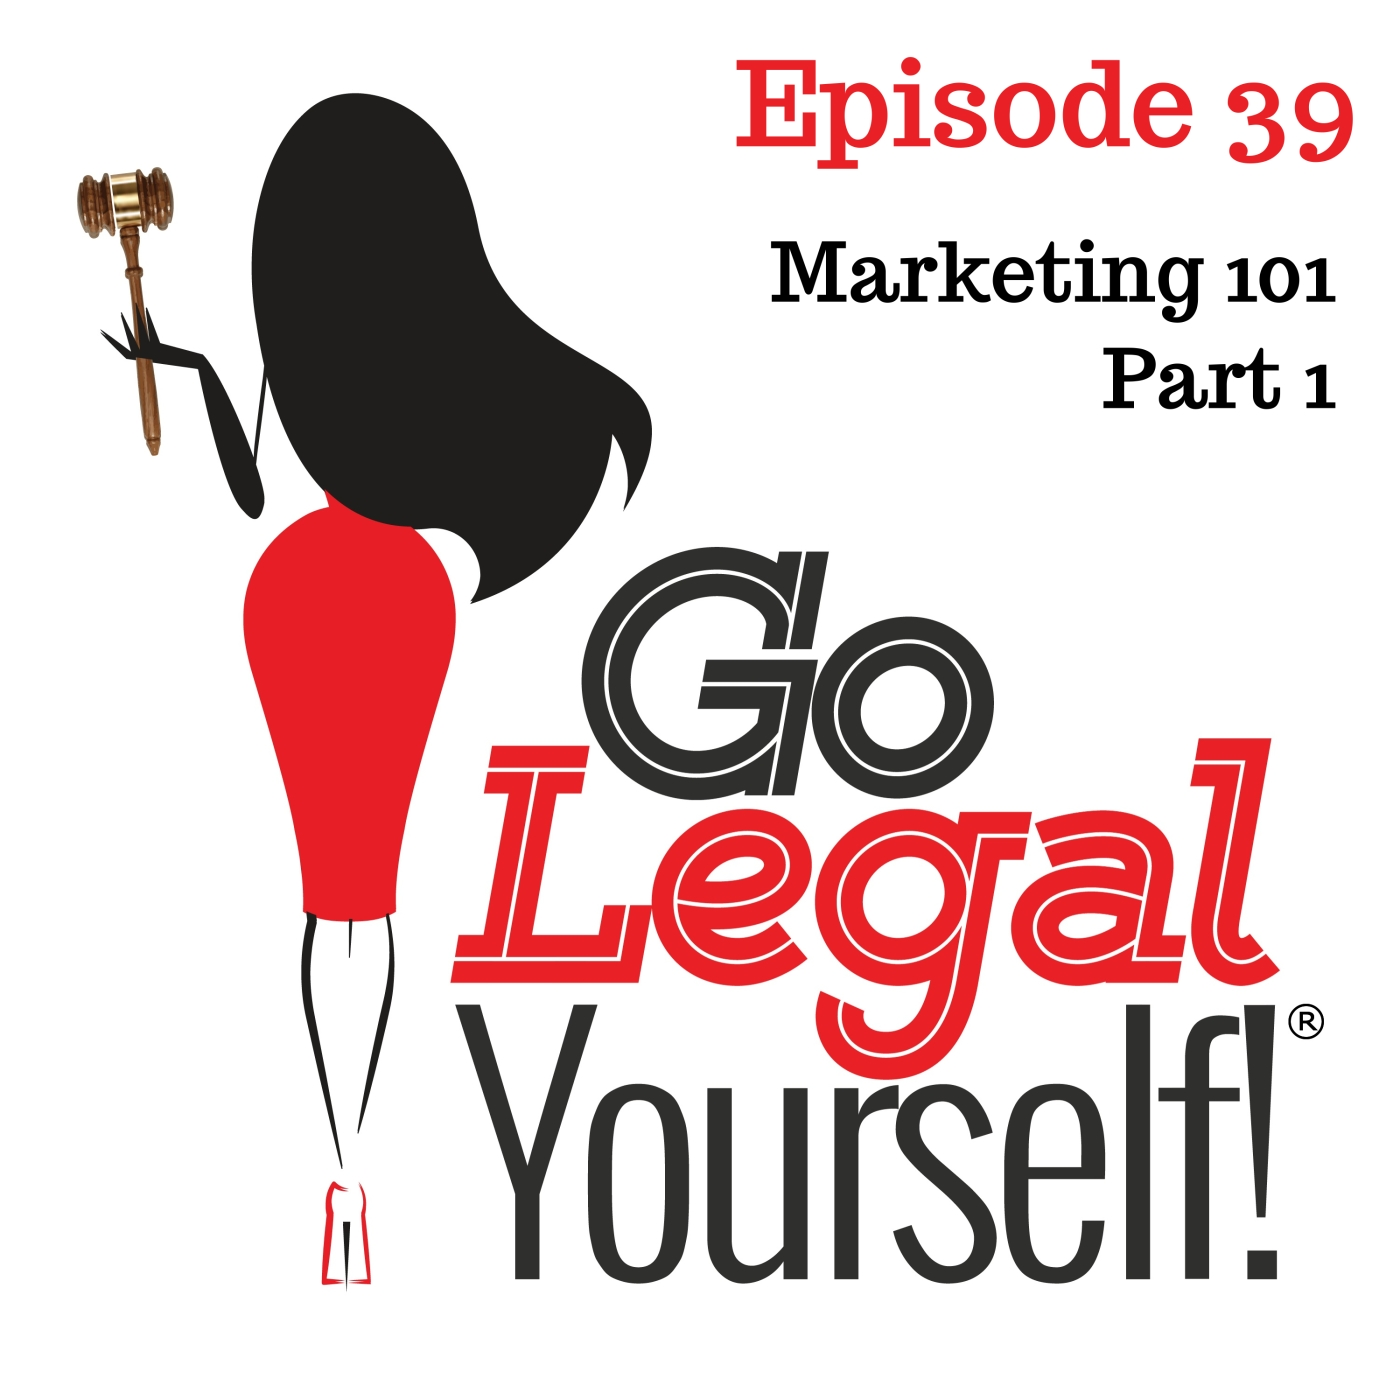 Ep. 39 Marketing 101 Part 1